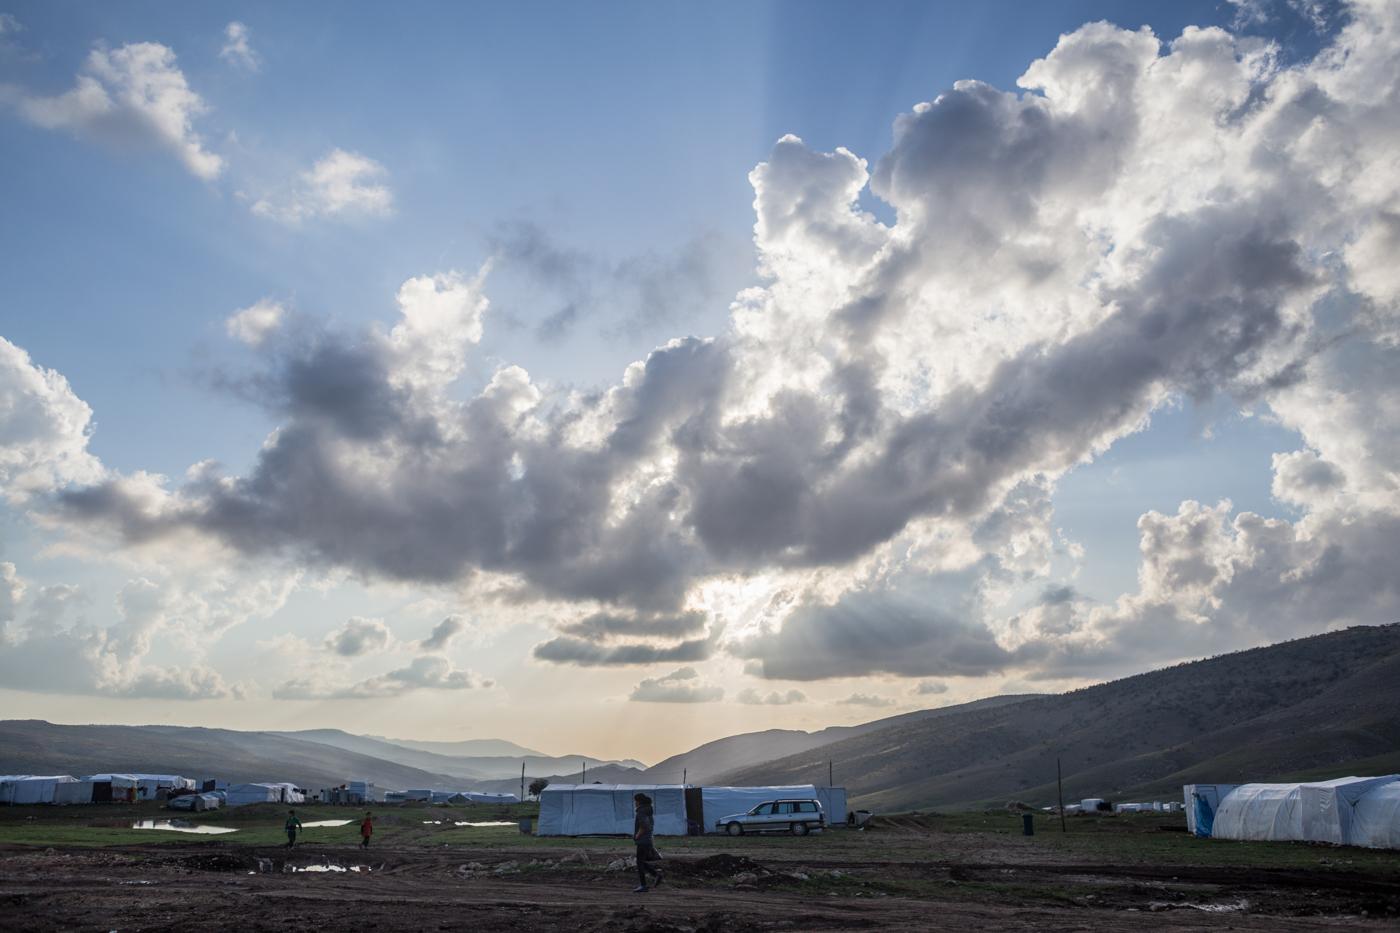 Giacomo_Sini_Italy_The_forgotten_people_of_Kurdistan_17.jpg